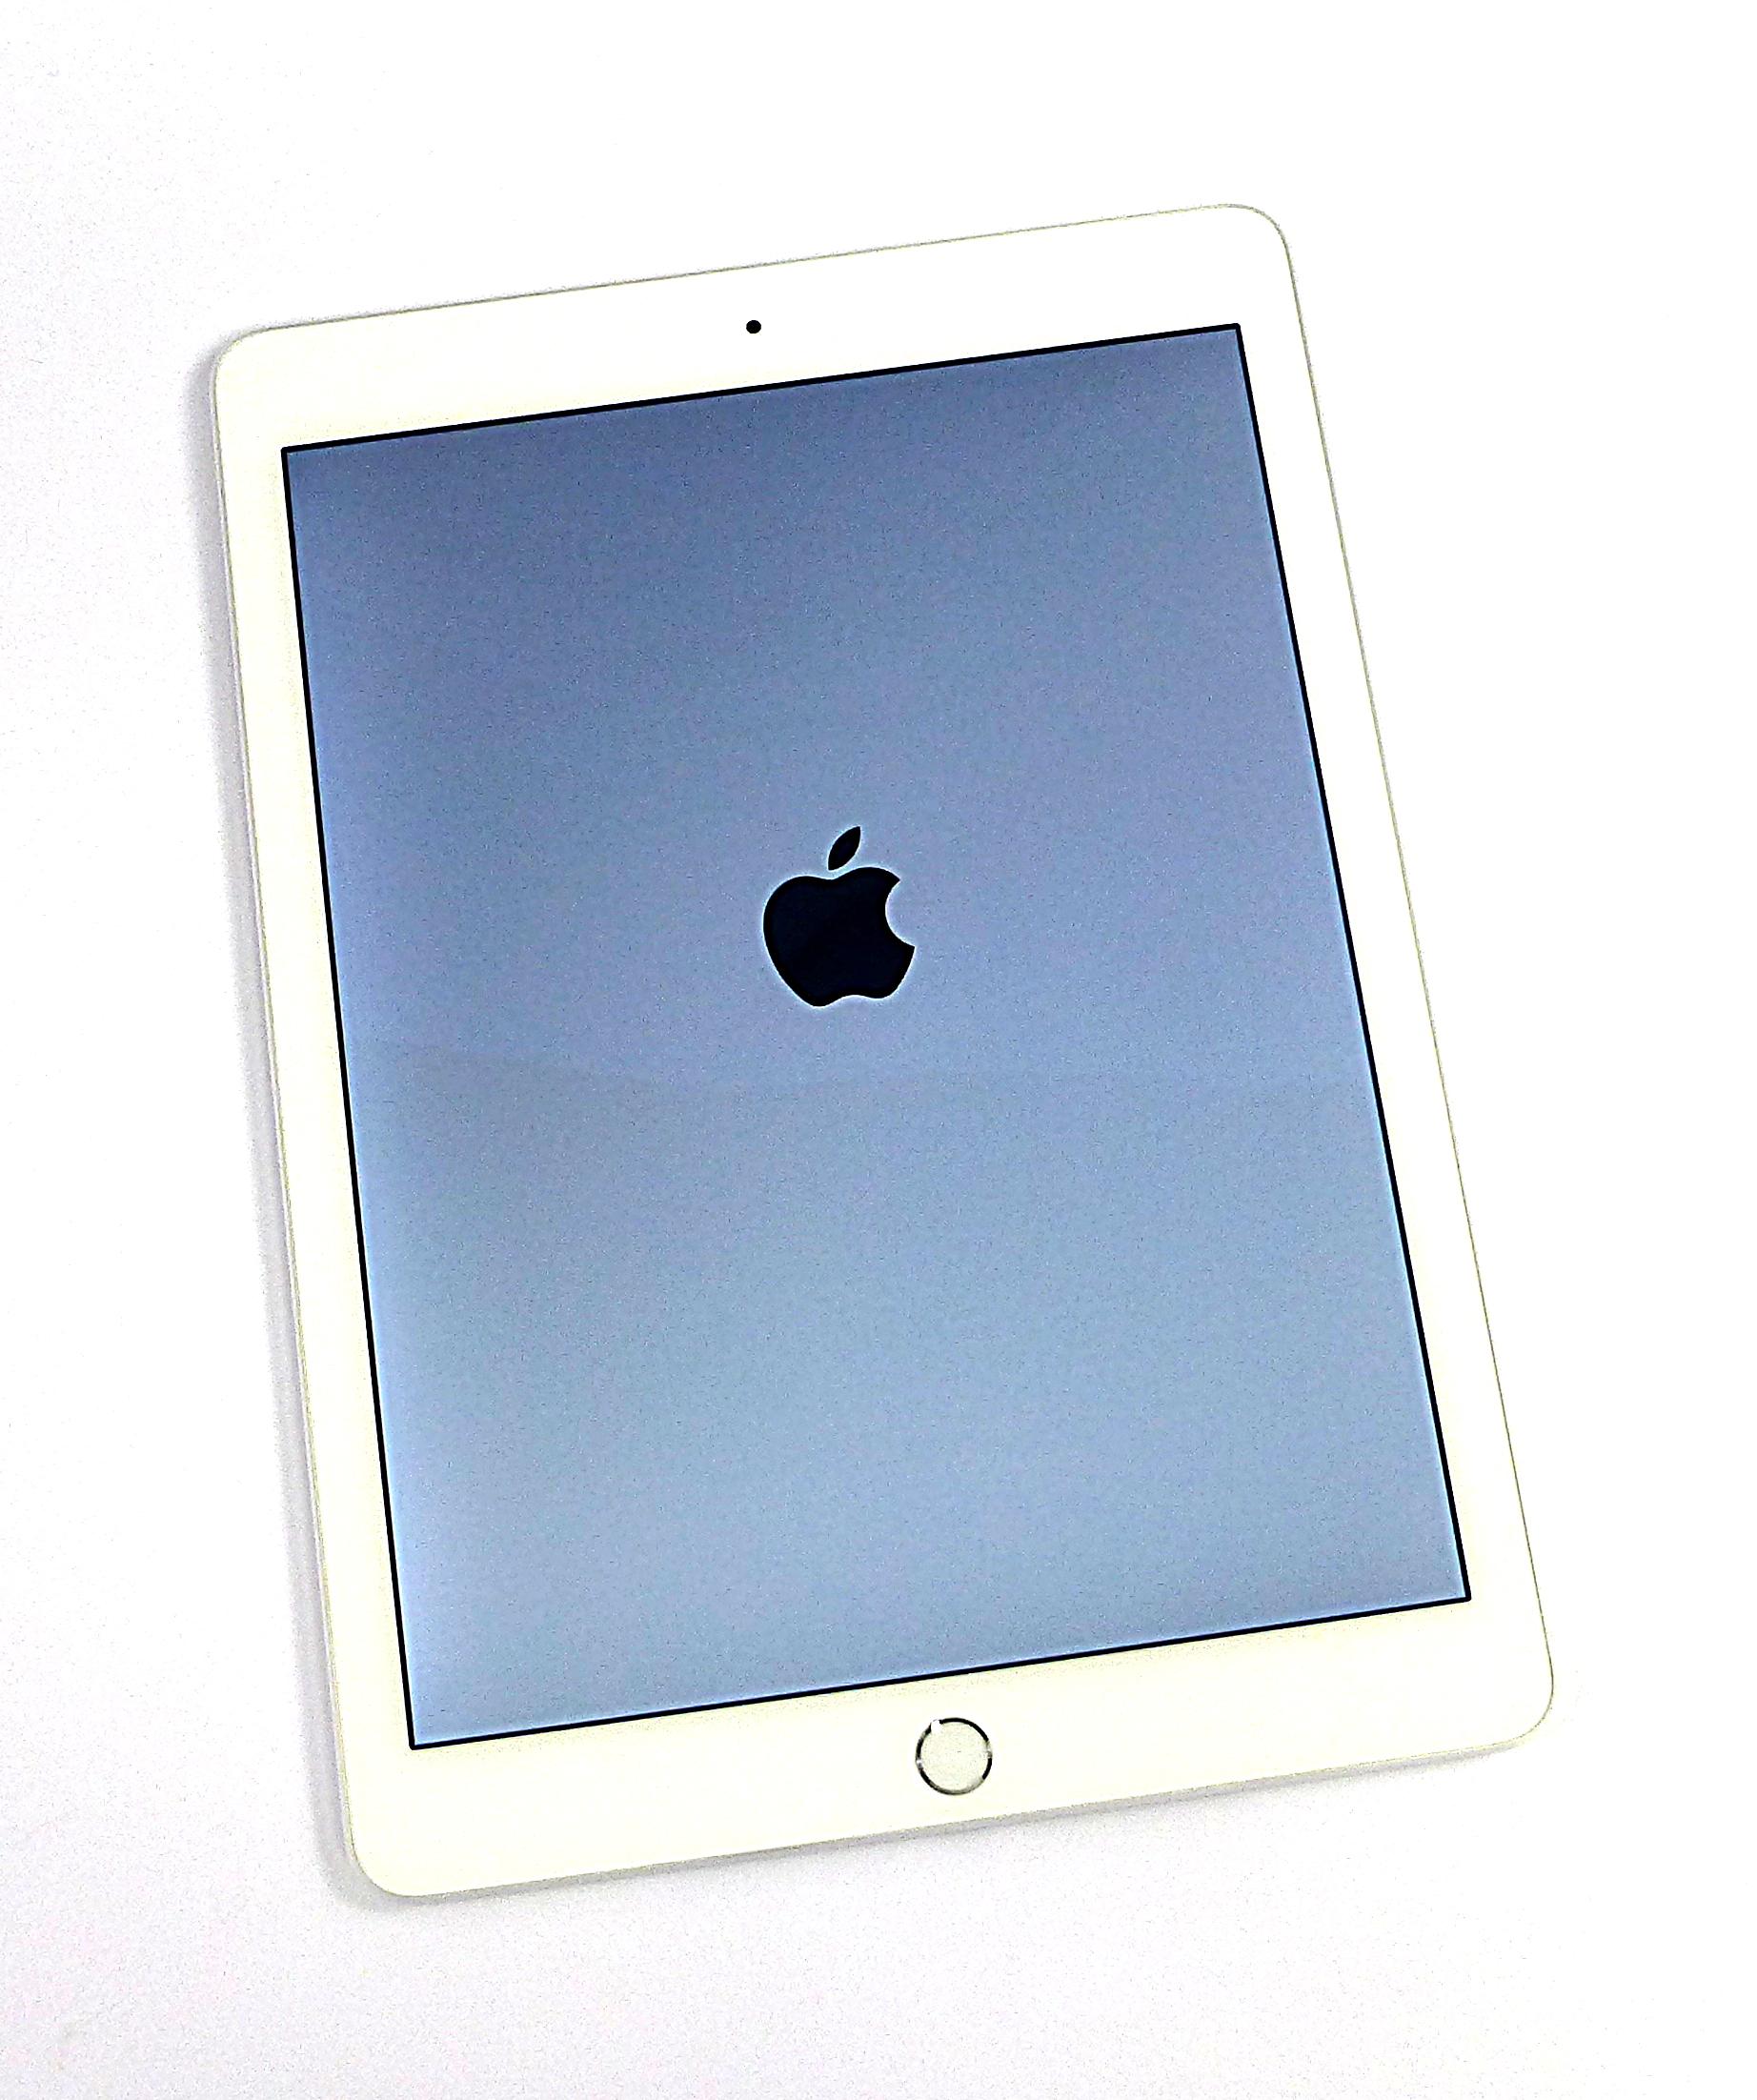 apple ipad air 2 wifi only 32gb 9 7 retina display silver. Black Bedroom Furniture Sets. Home Design Ideas